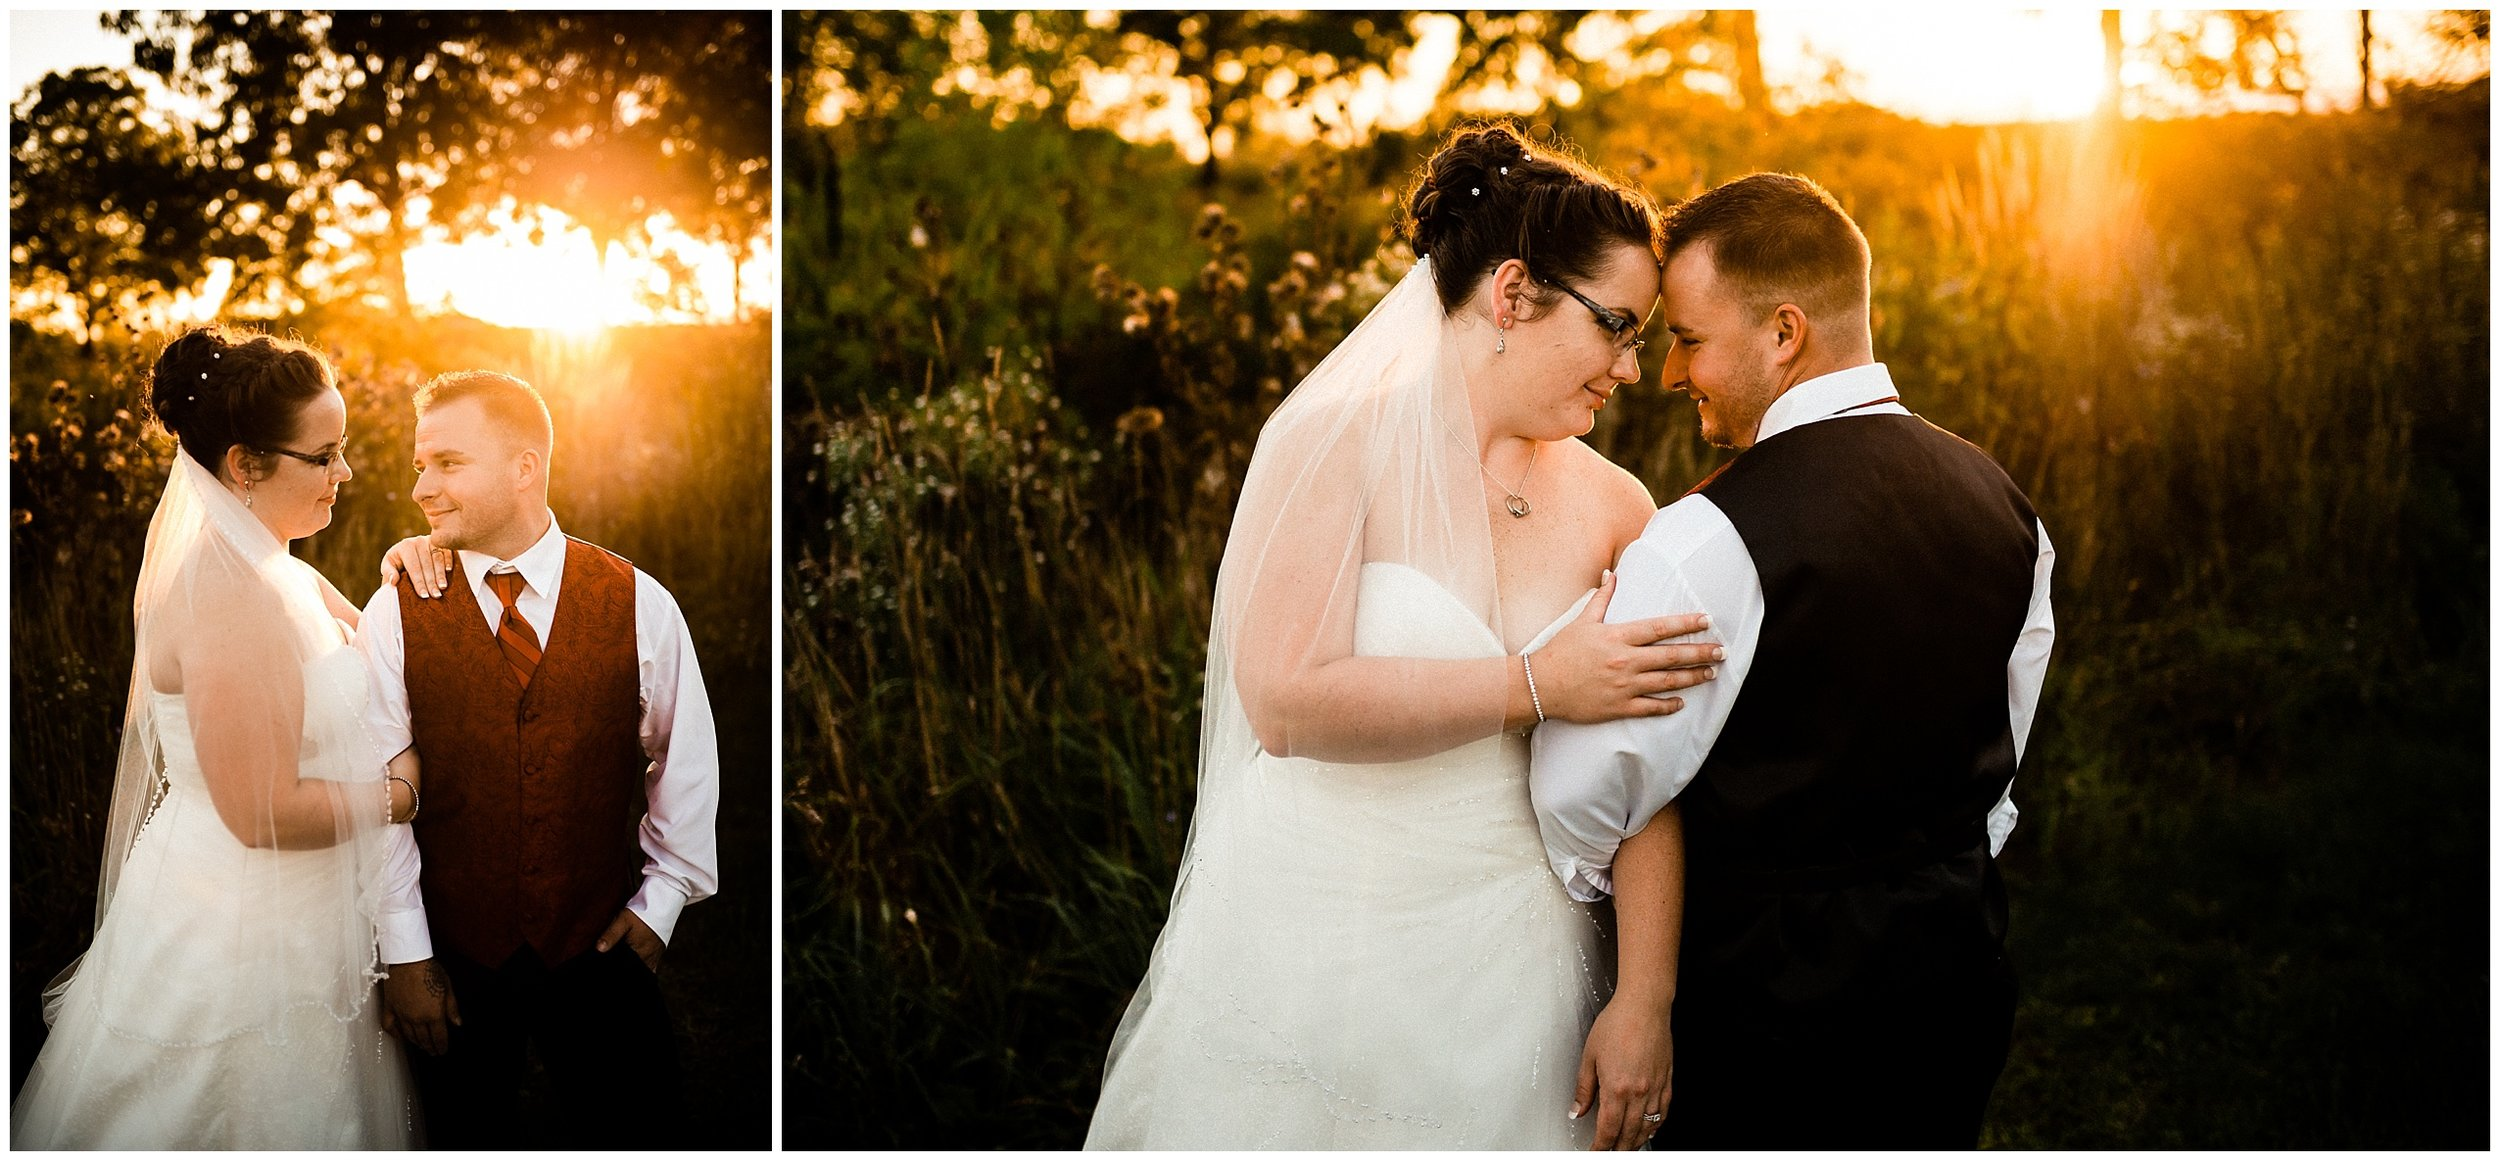 Micheal + Chelsie   Just Married #kyleepaigephotography_1610.jpg